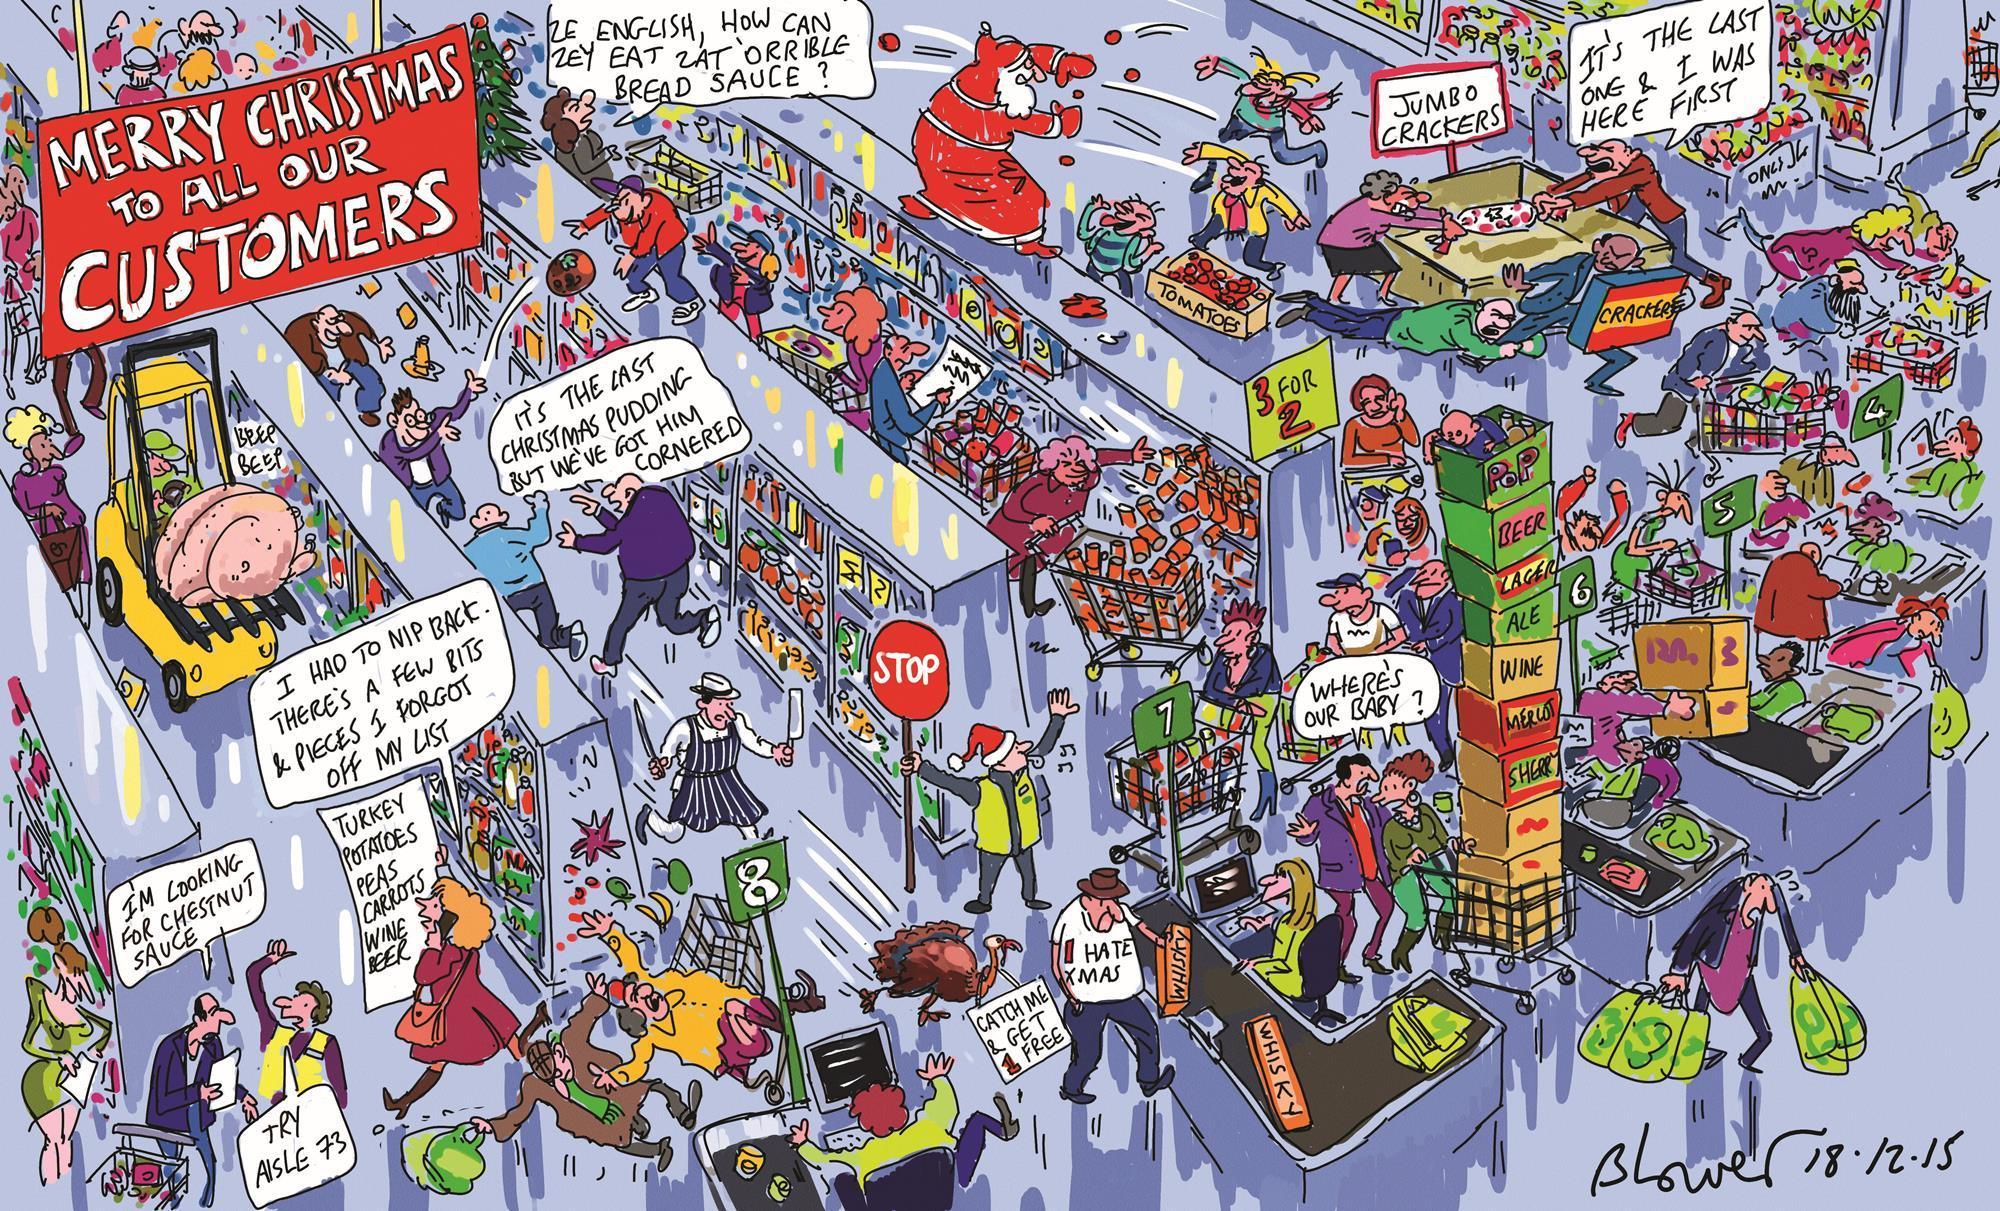 blower u0027s retail cartoon the last minute retail rush to christmas